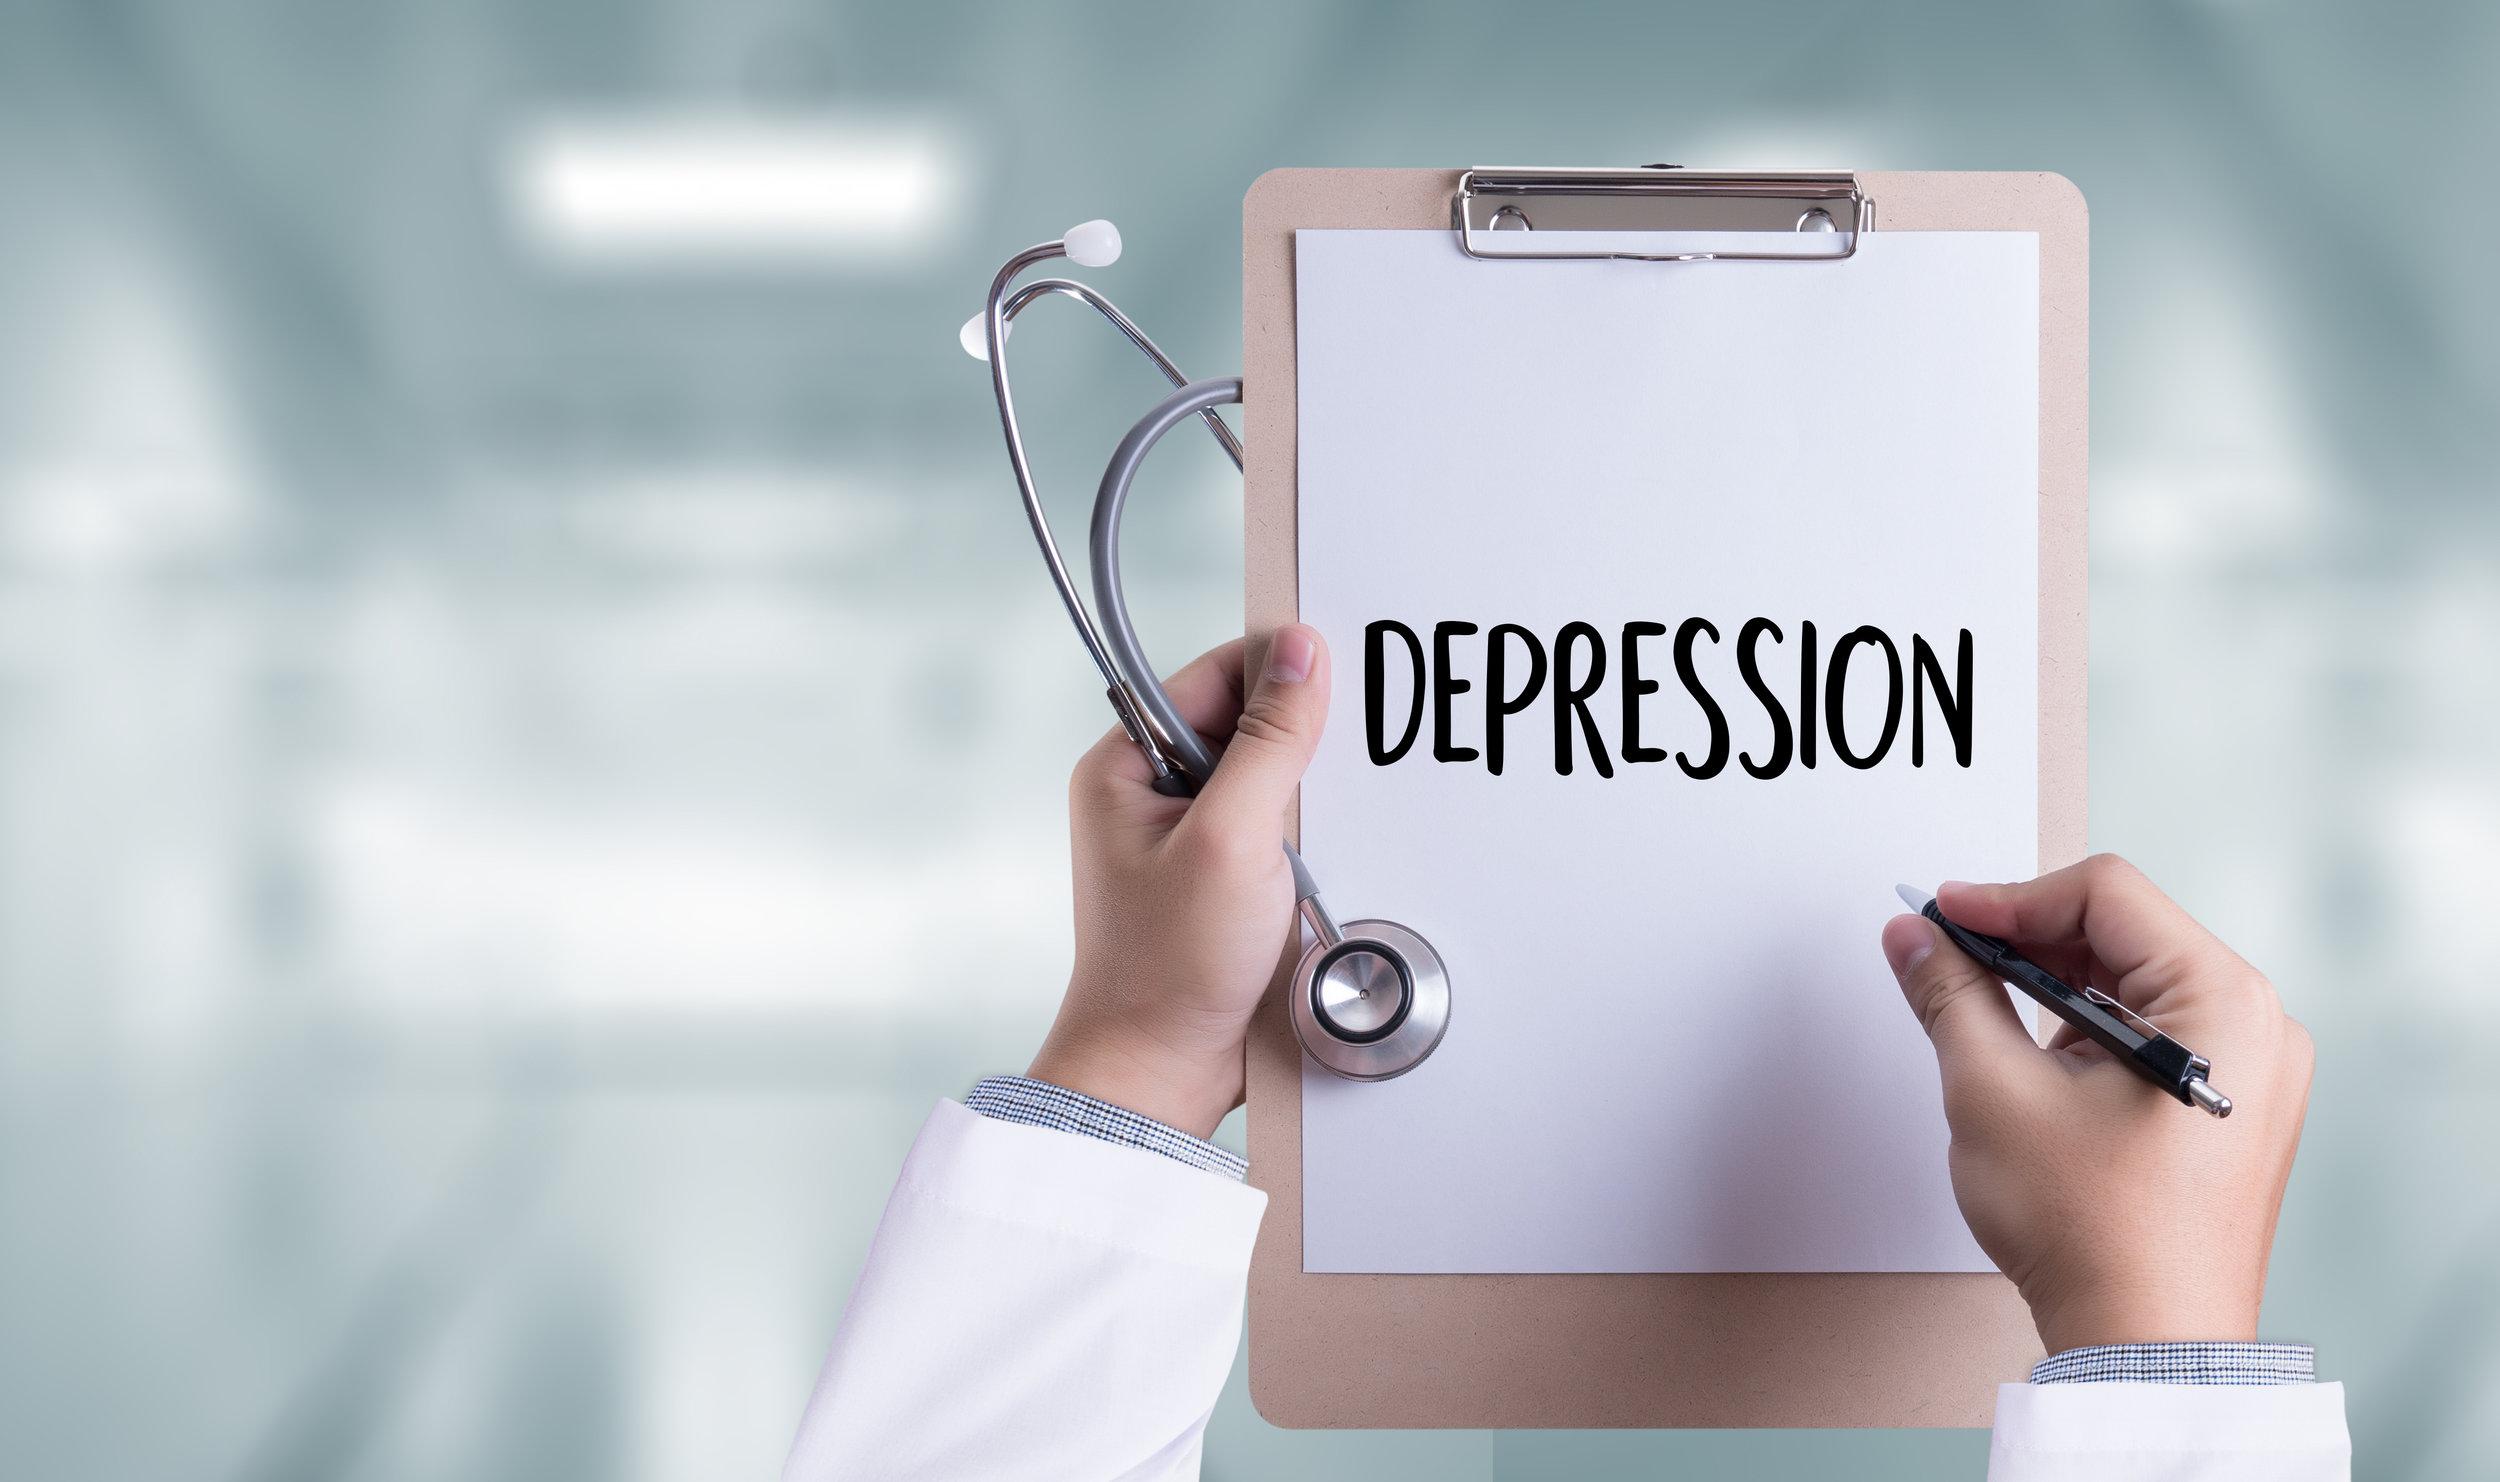 bigstock-Depression-Miserable-Depresse-158698946.jpg